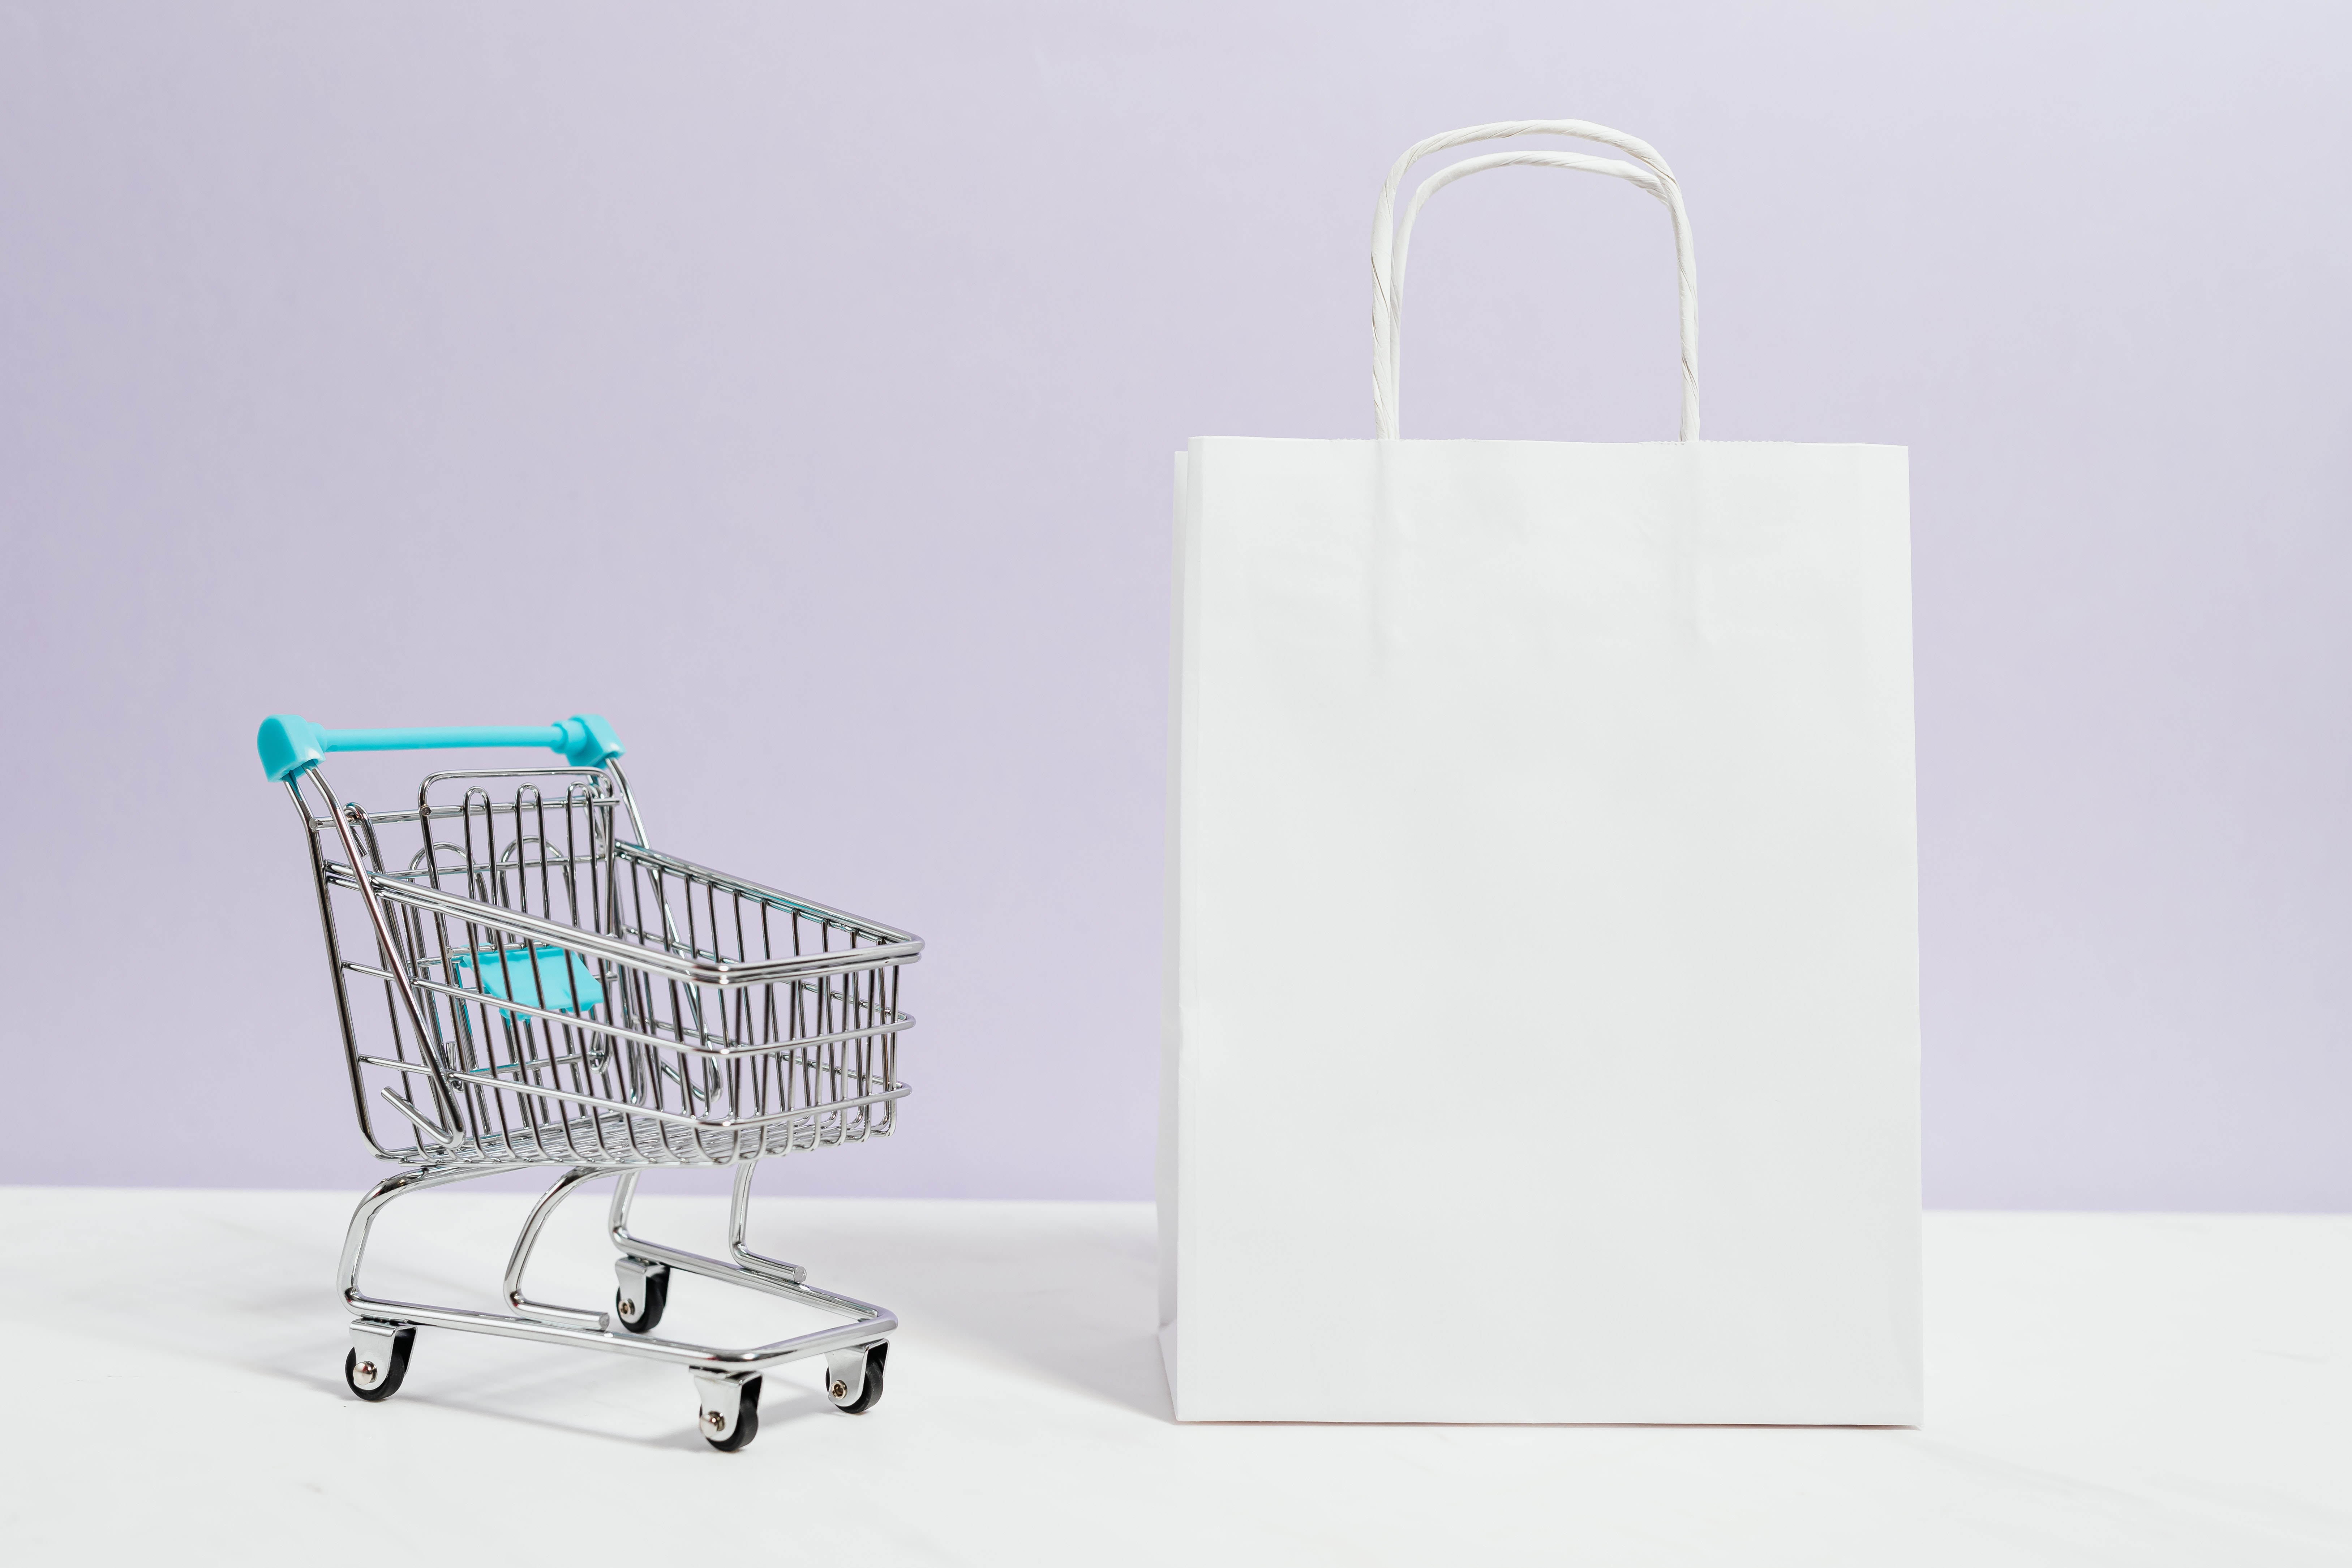 digital transformation retail stores